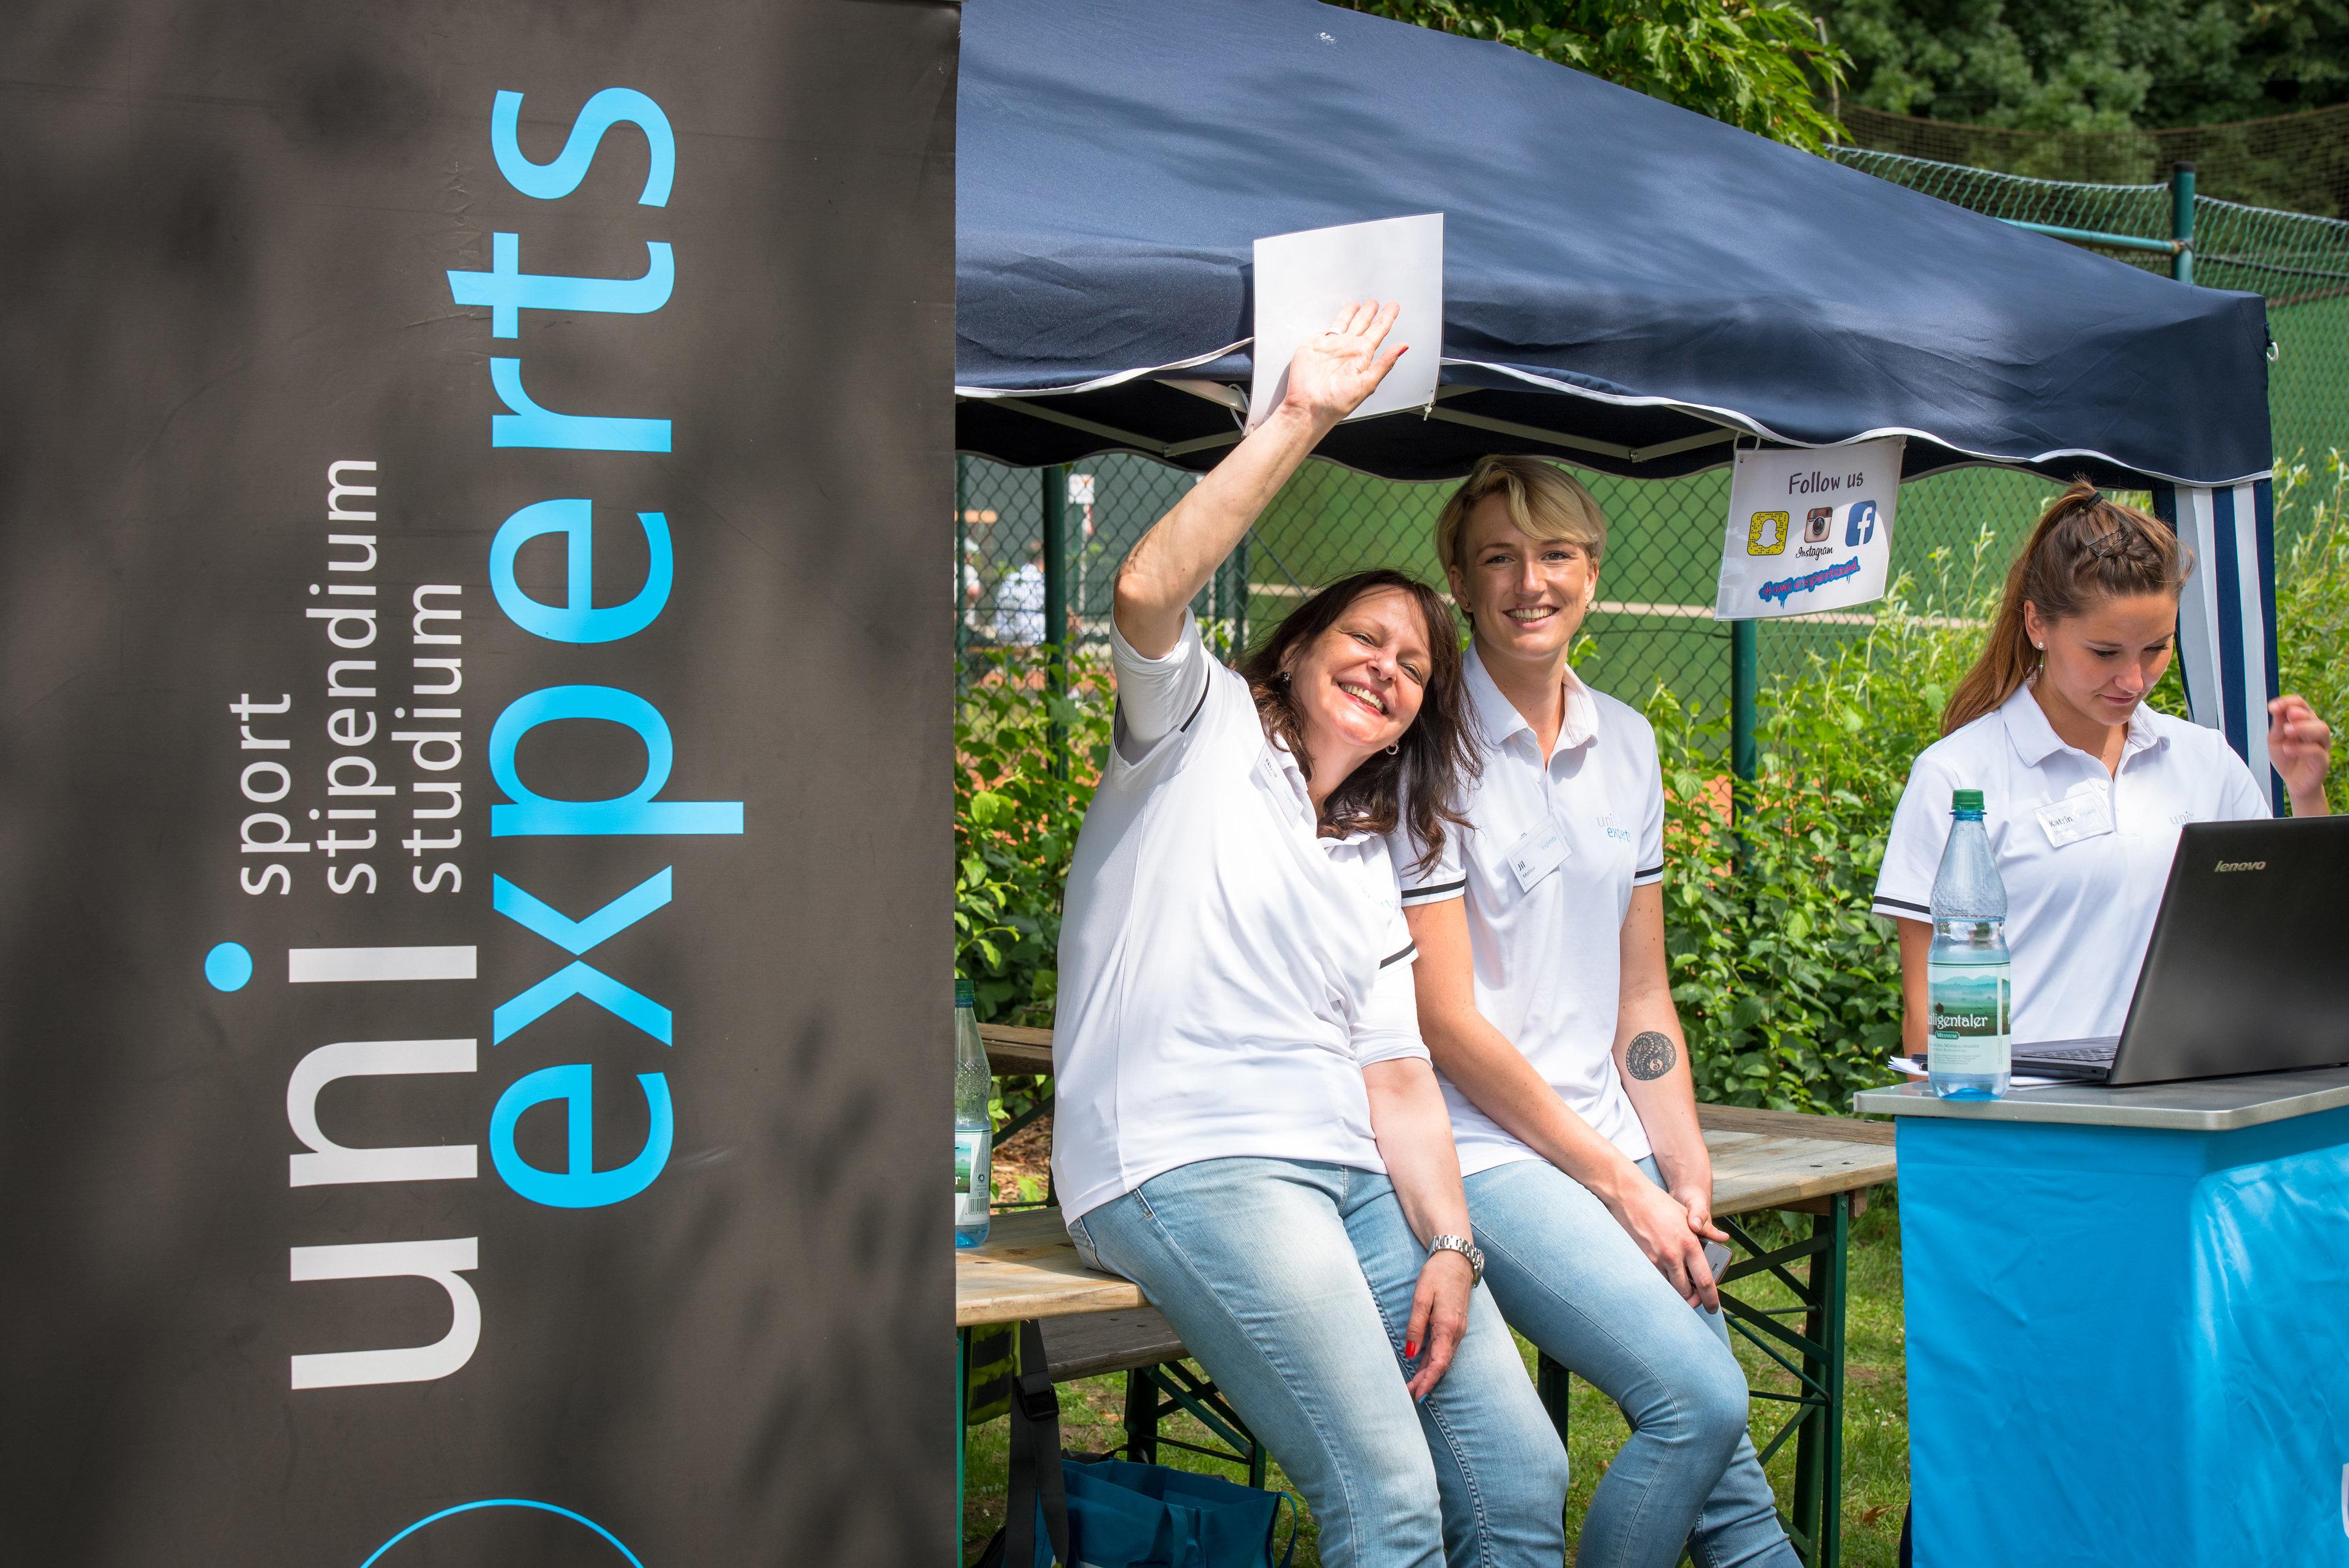 UniExperts-2017TennisShowcase-99